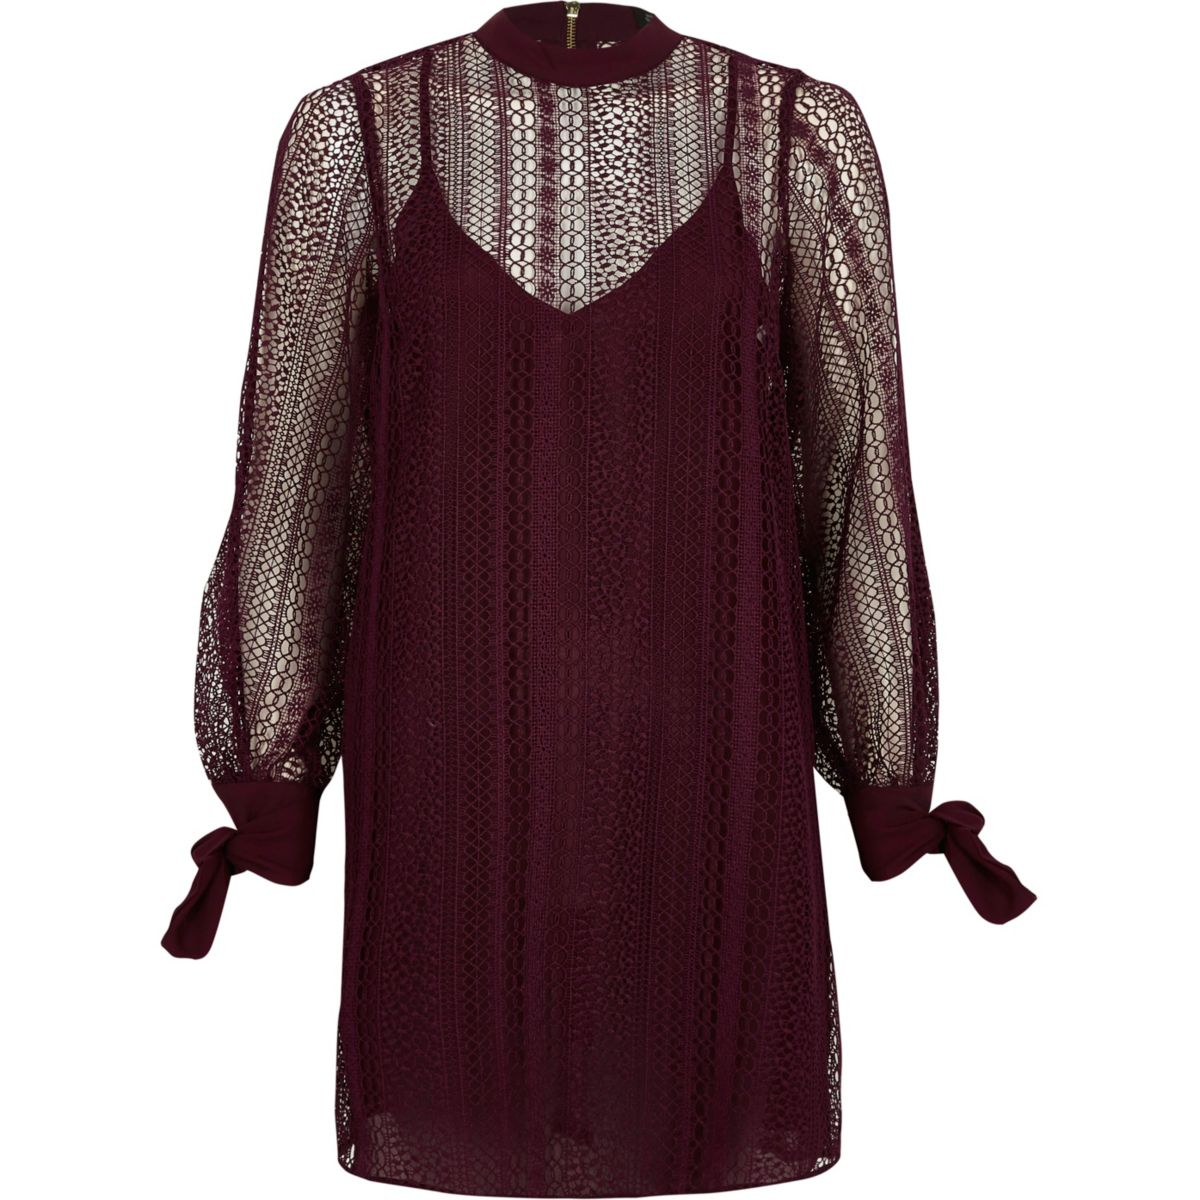 Dark red lace high neck swing dress